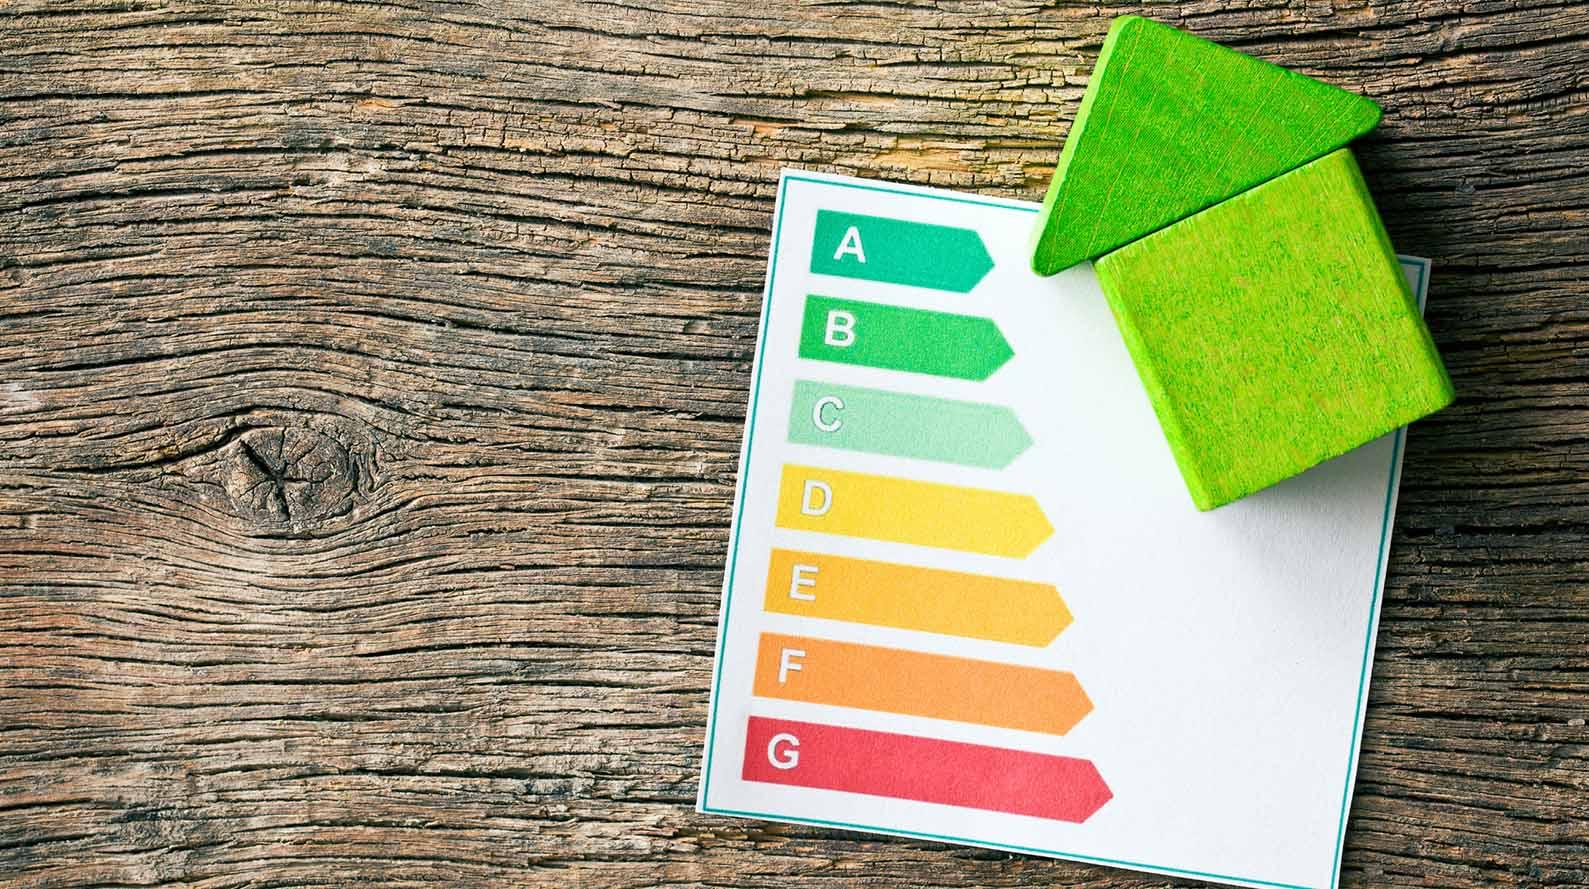 property certificates epc pat test eicr gas safety asbestos fire risk glasgow glasgow